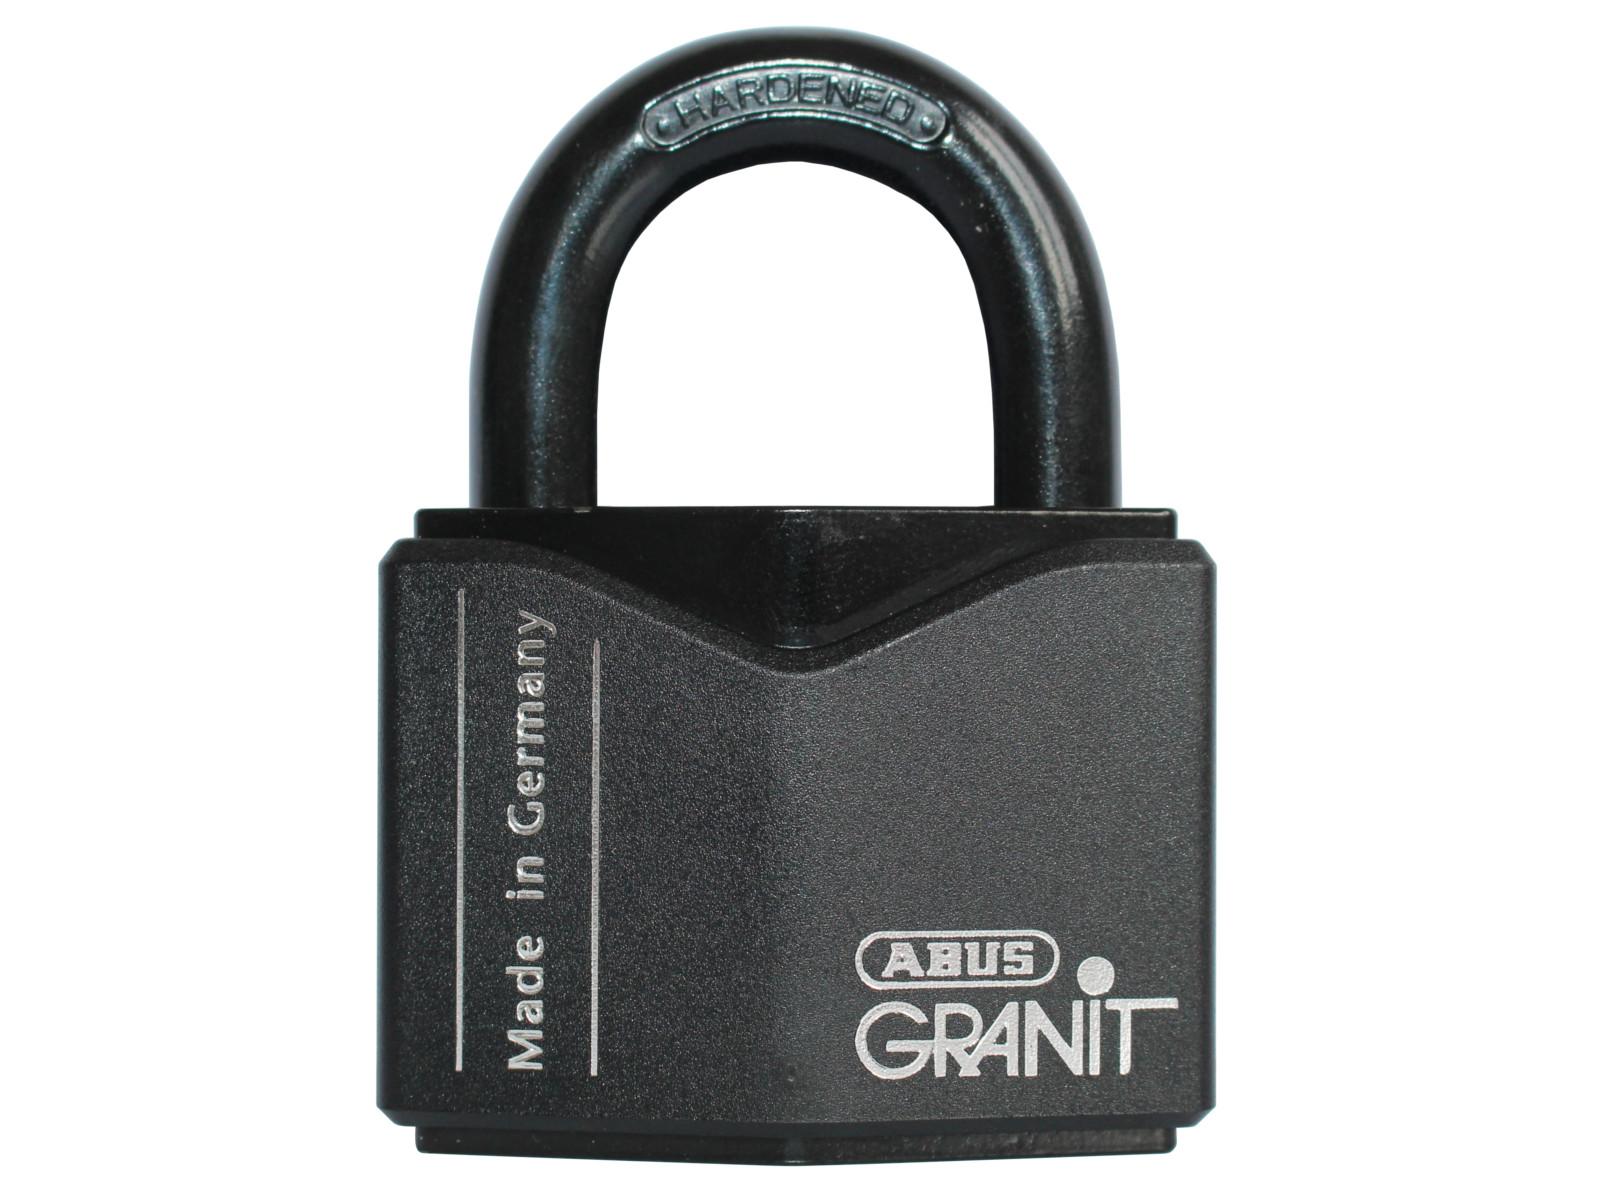 vorh ngeschloss abus granit 37 55 sicherheitsschloss sqs. Black Bedroom Furniture Sets. Home Design Ideas